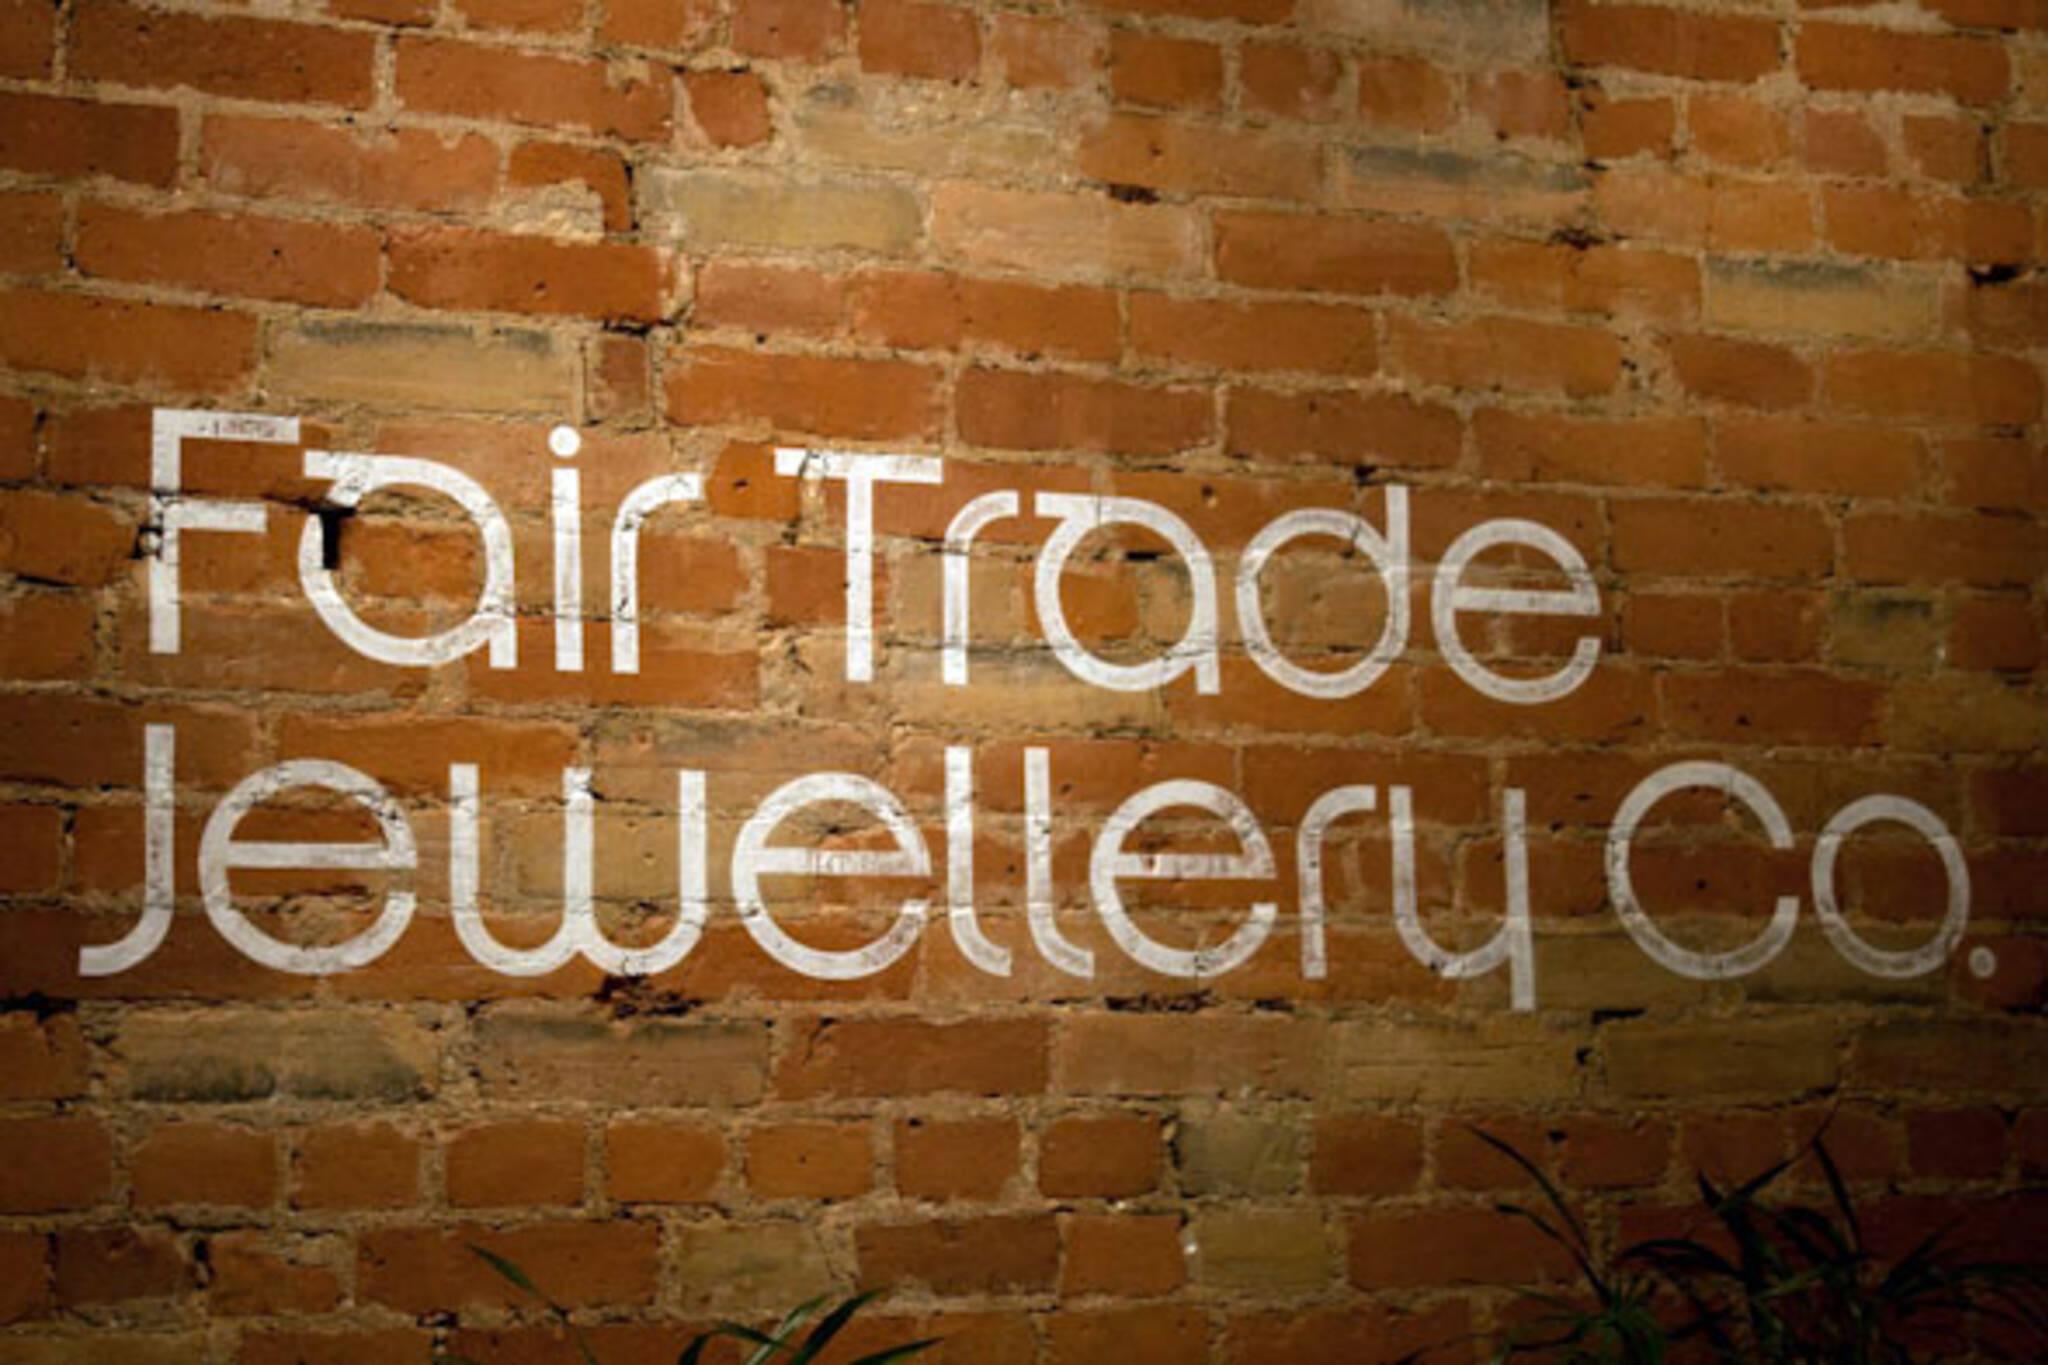 Fair Trade Jewellery Toronto